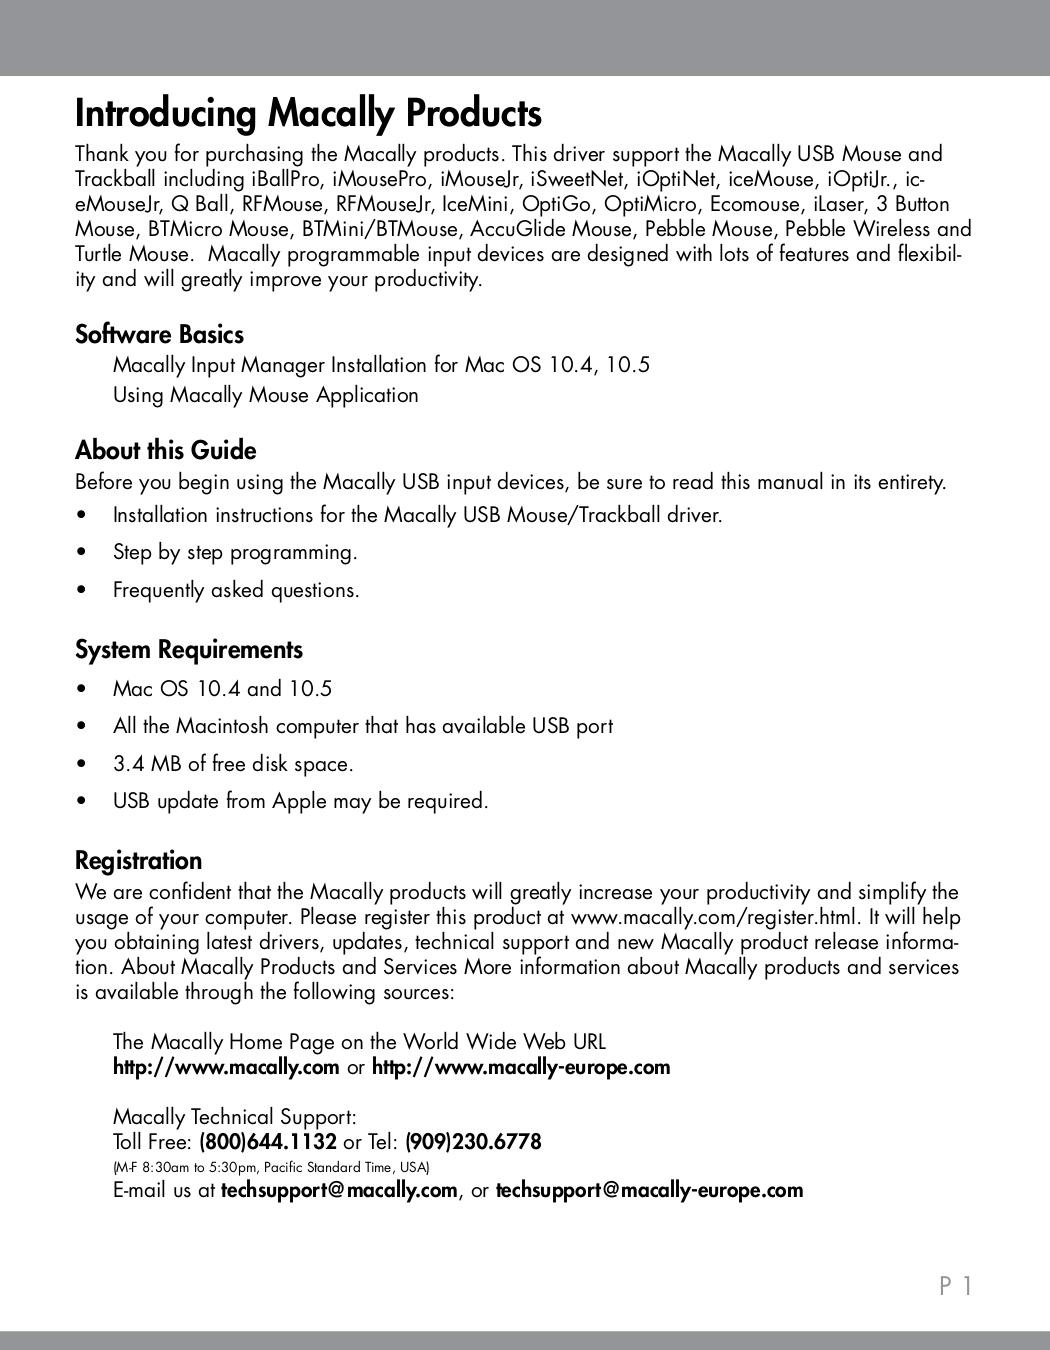 M600i Manual Wap Ebook Necchi 4795 Sewing Machine Threading Diagram Array Ch 20 Ap Bio Guided Answer Rh Sportingpenistone Org Uk Mf 65